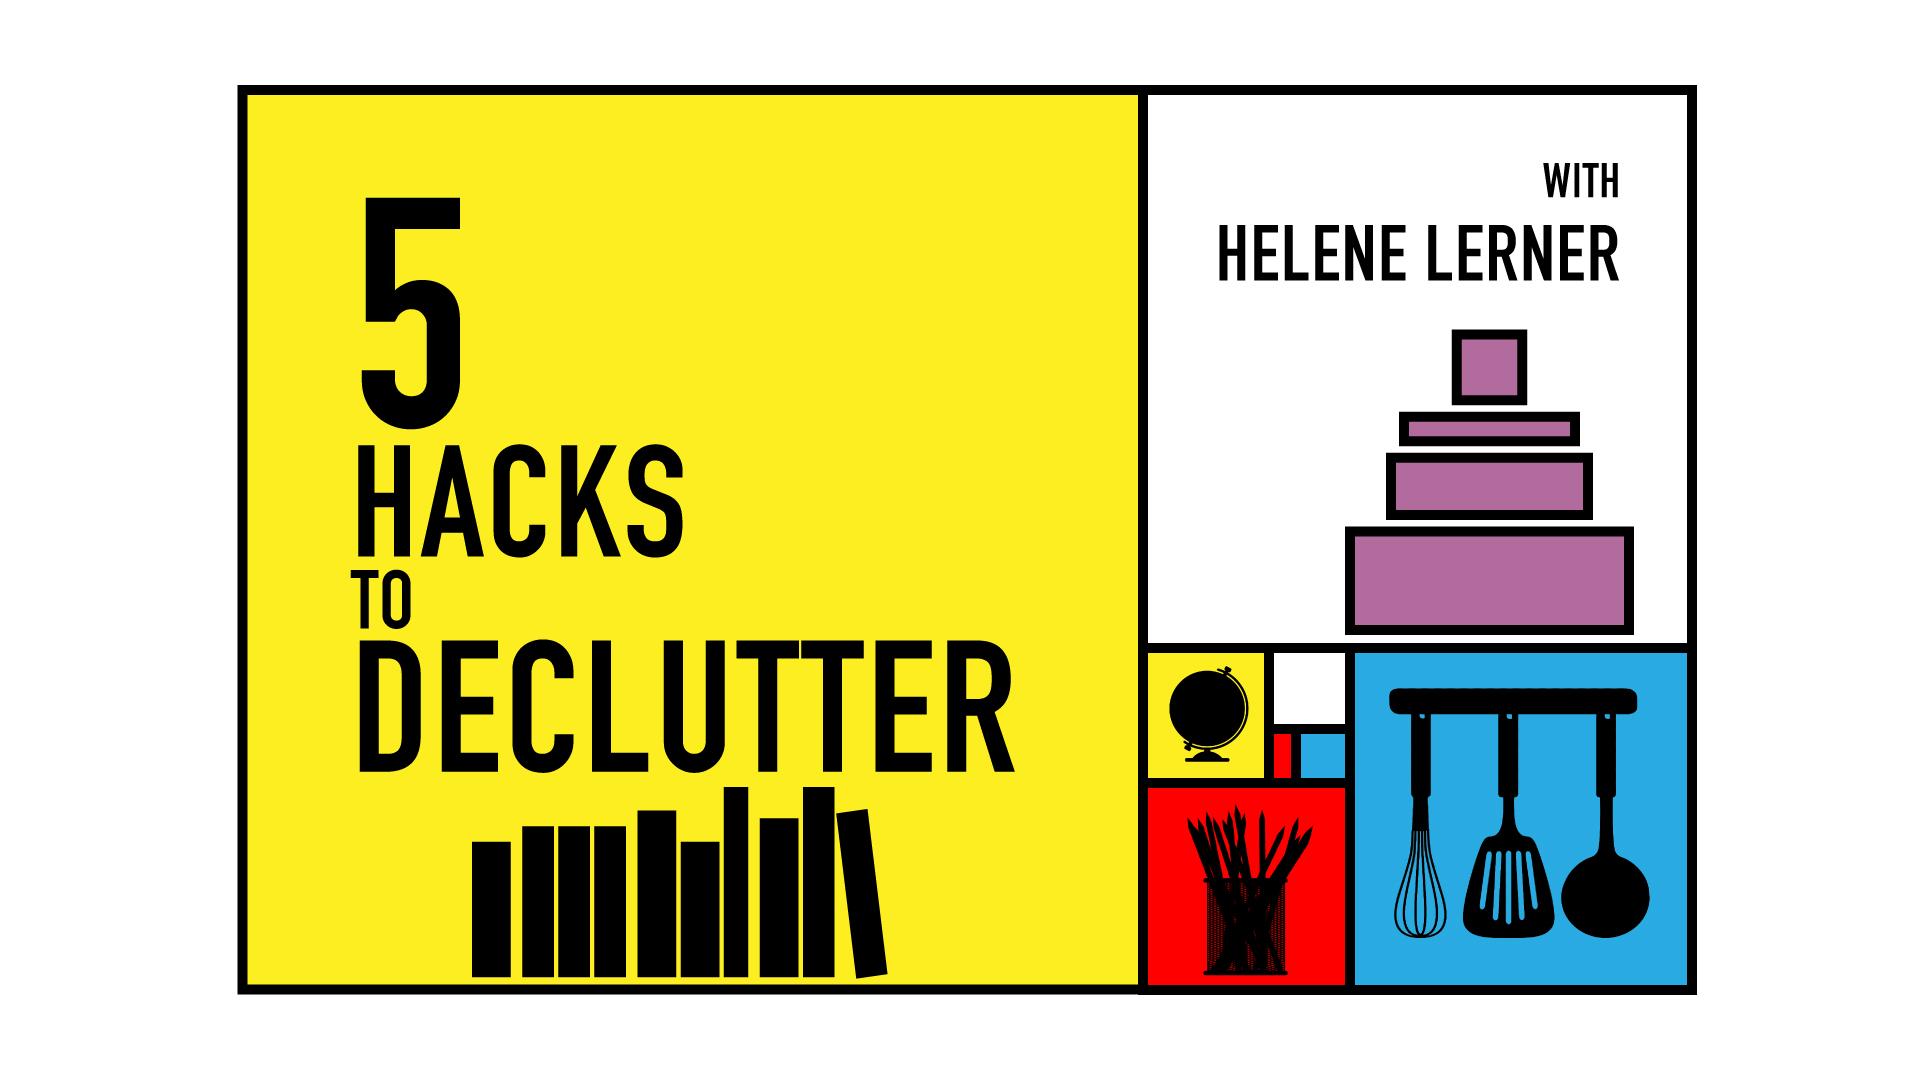 TestThumbnail_WomenWorking_5Hacks_Declutter3.jpg